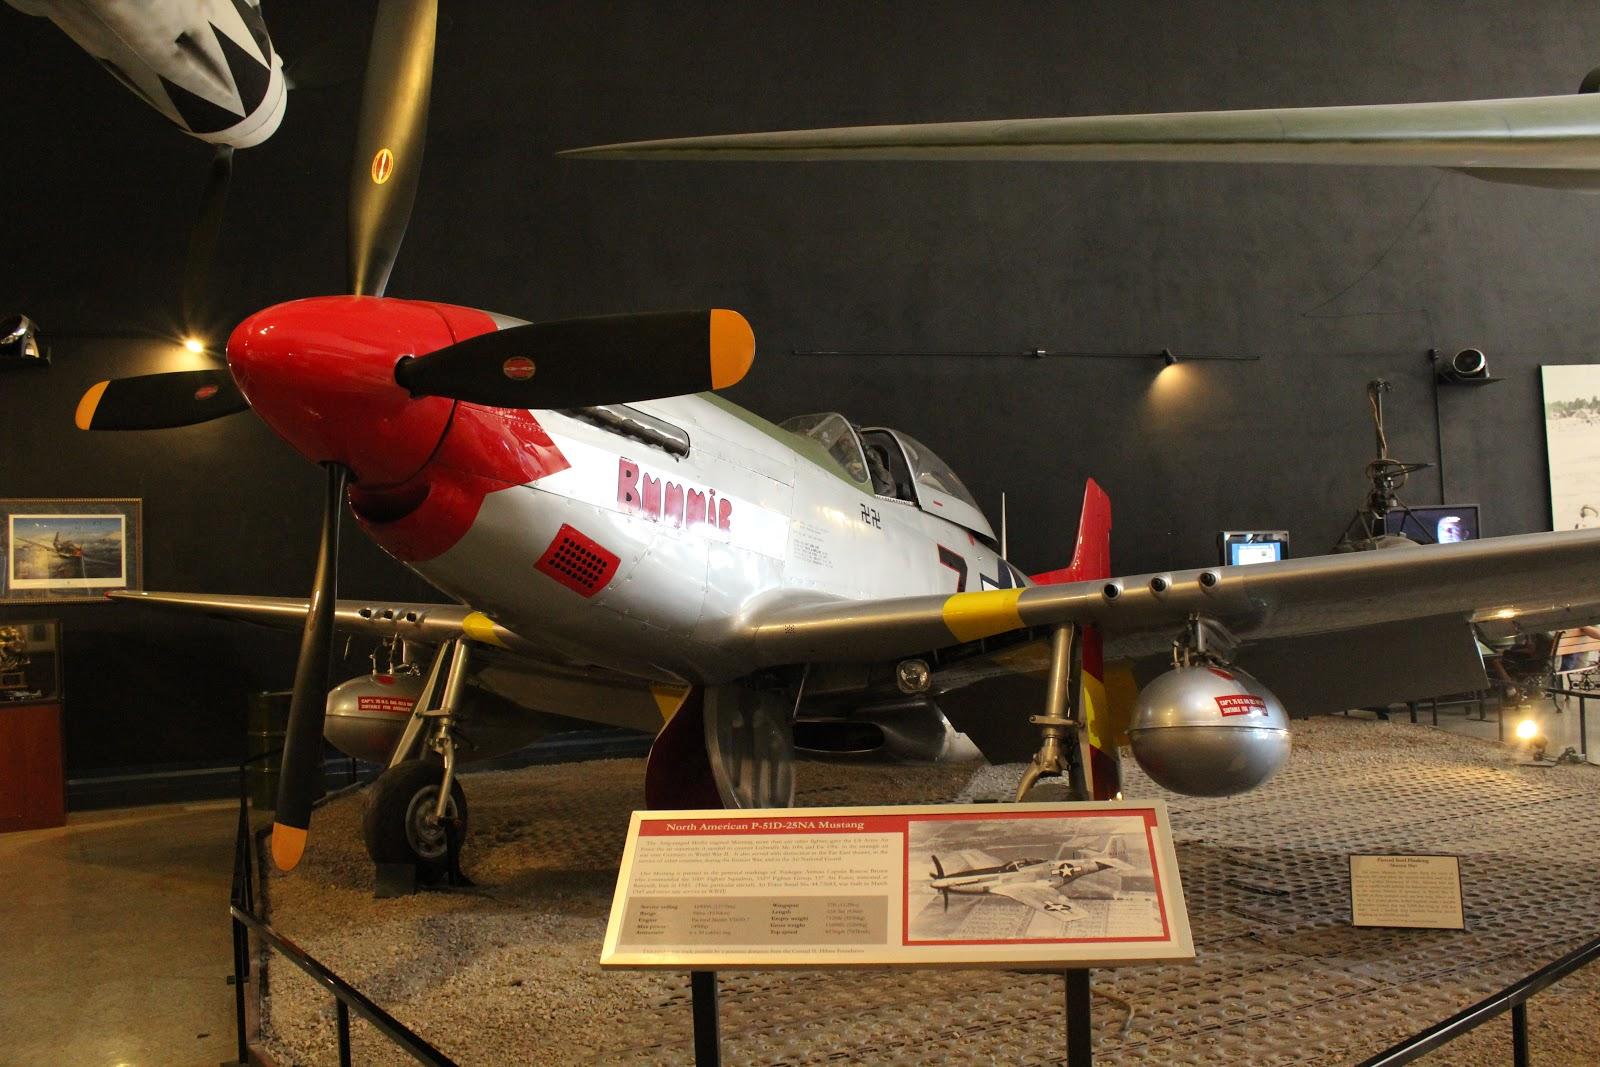 P-51 Mustang — музей авиации и космонавтики (Сан-Диего)